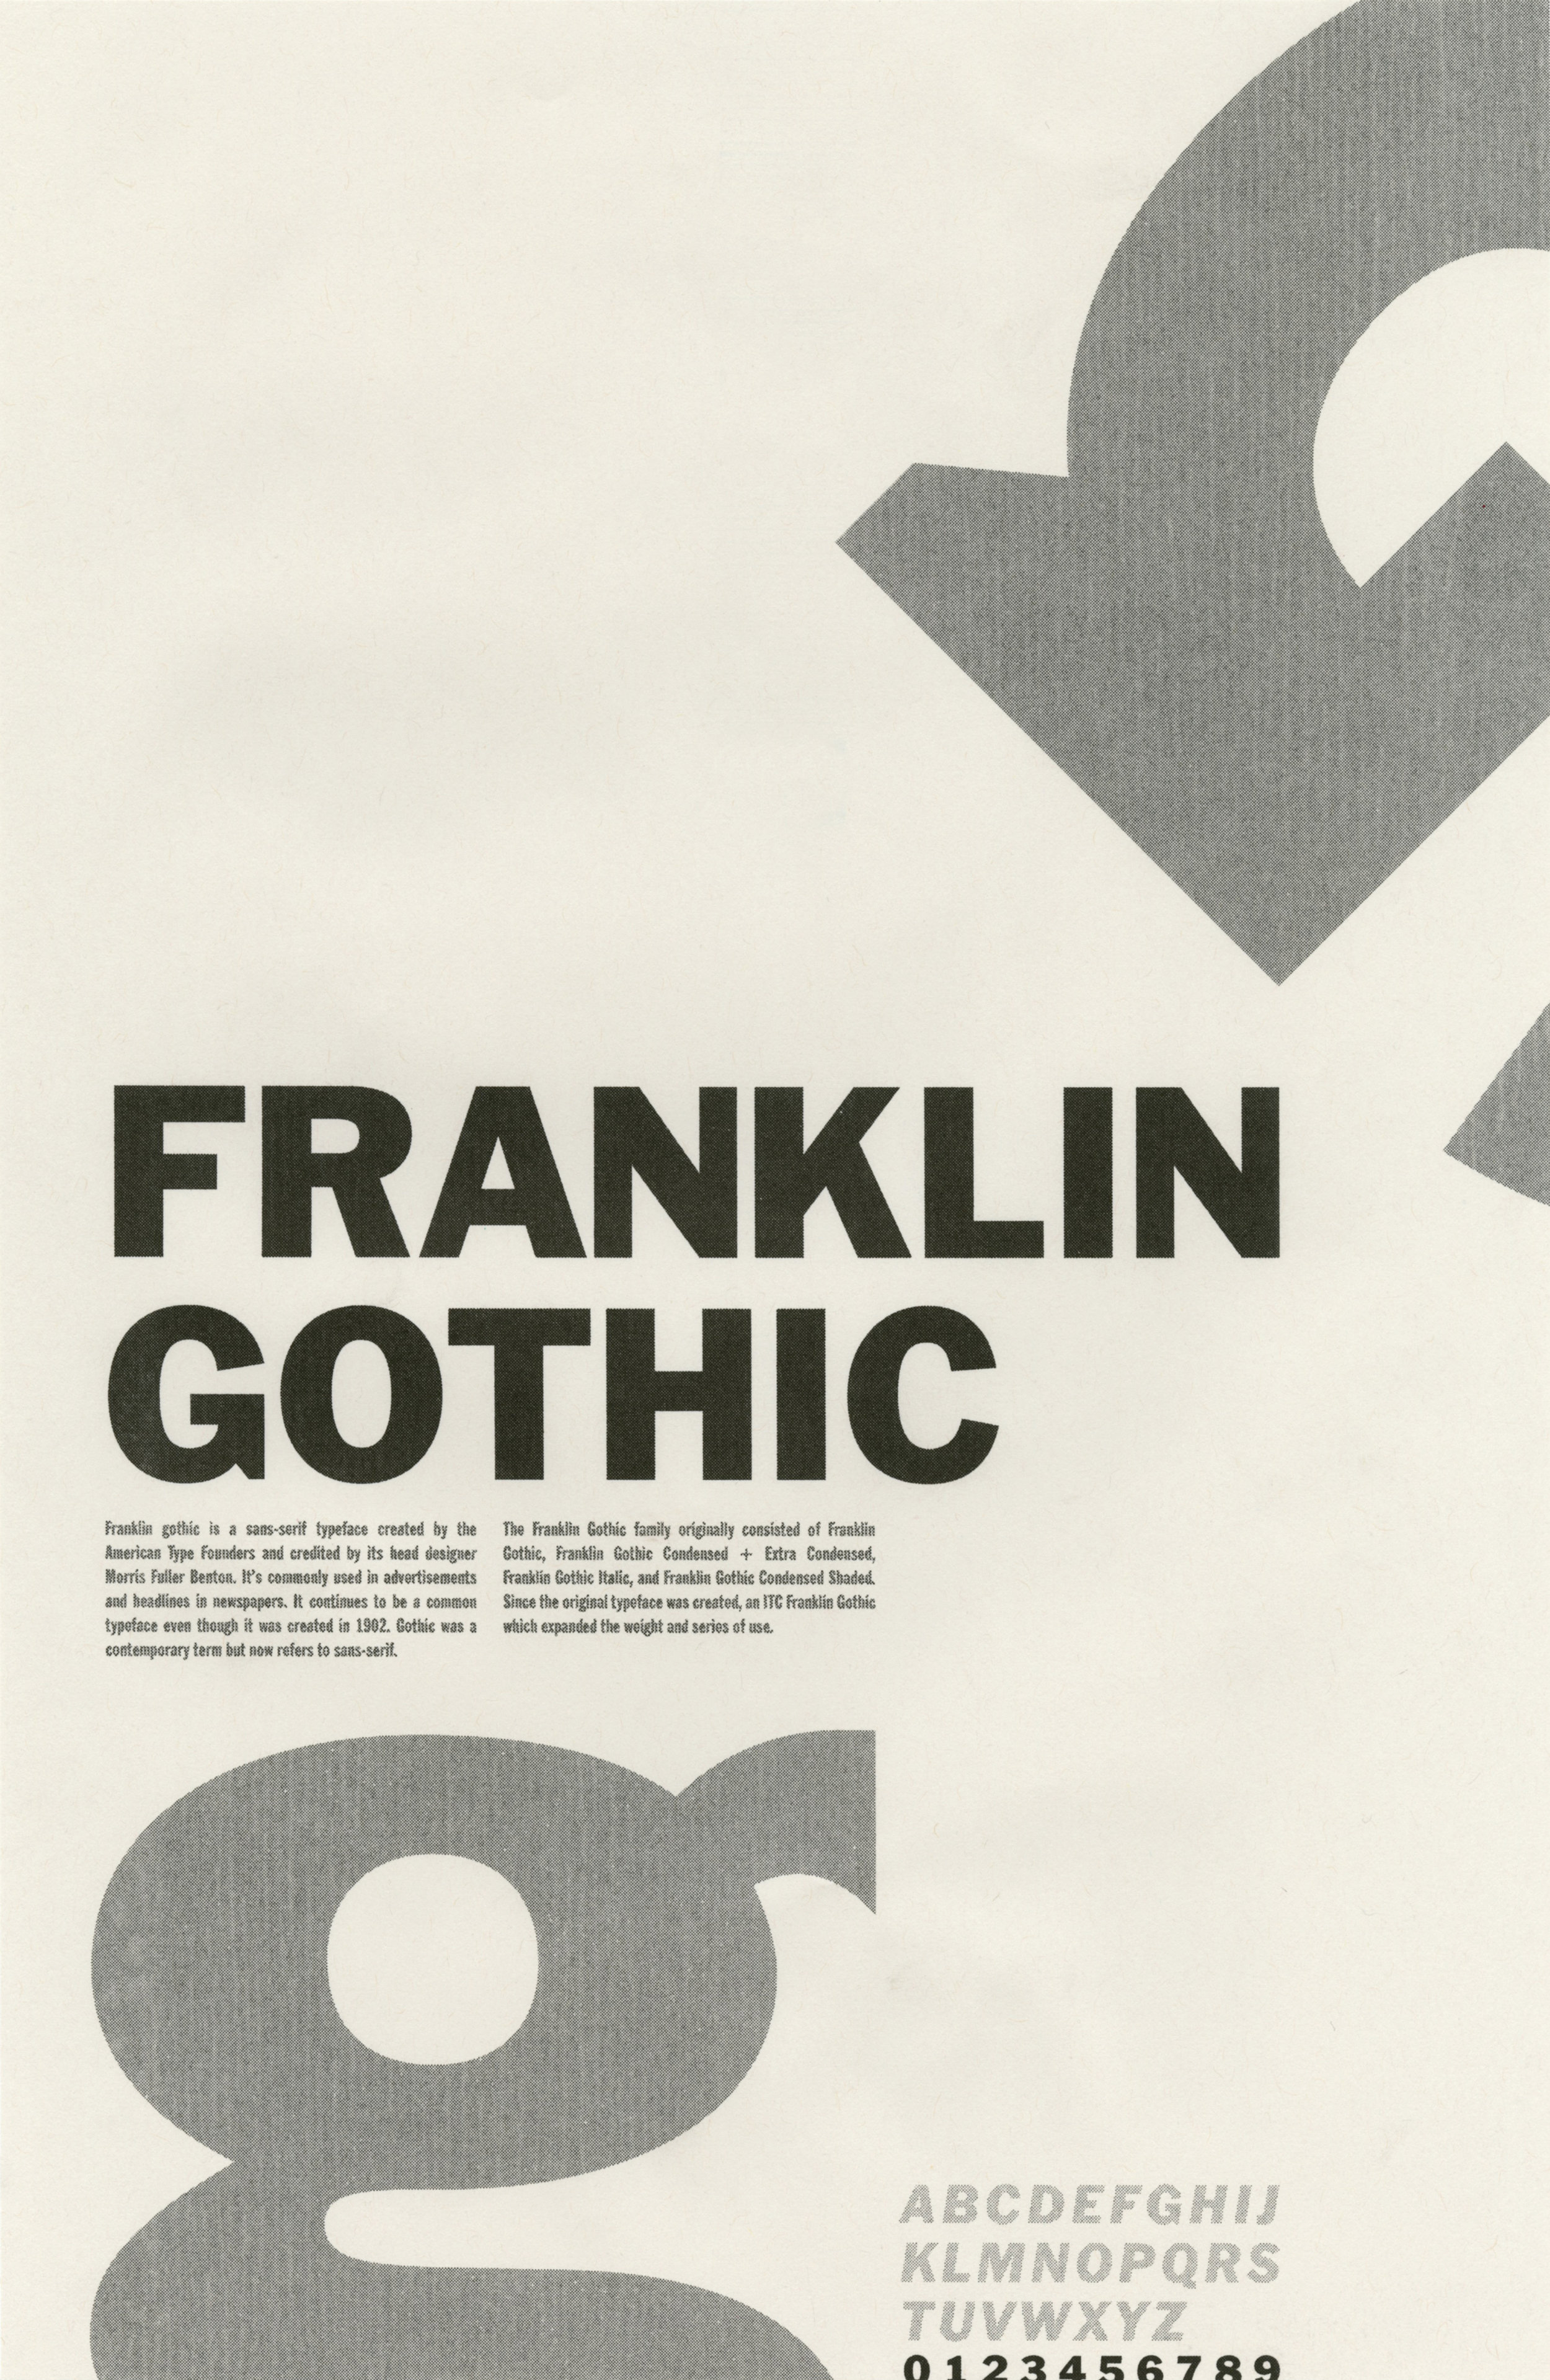 FranklinGothic.jpg